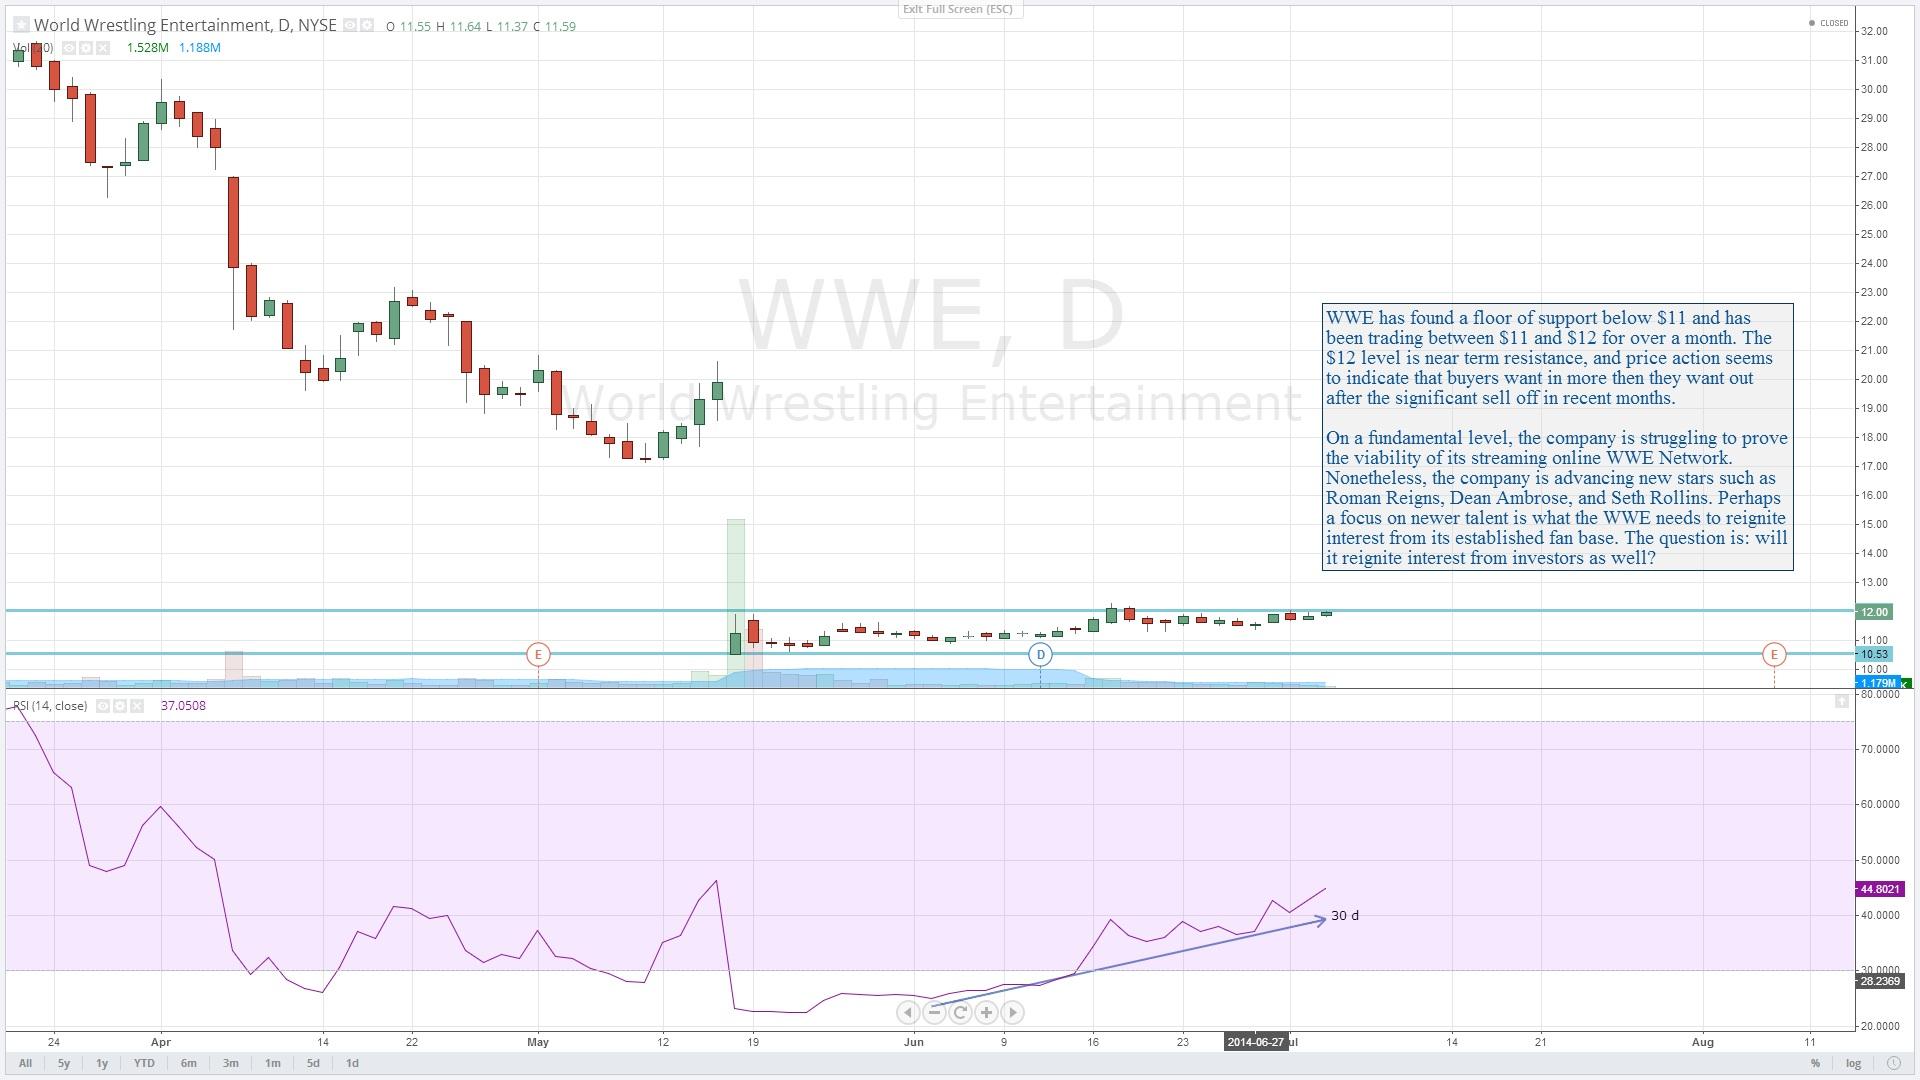 $WWE : World Wrestling Entertainment Inc.